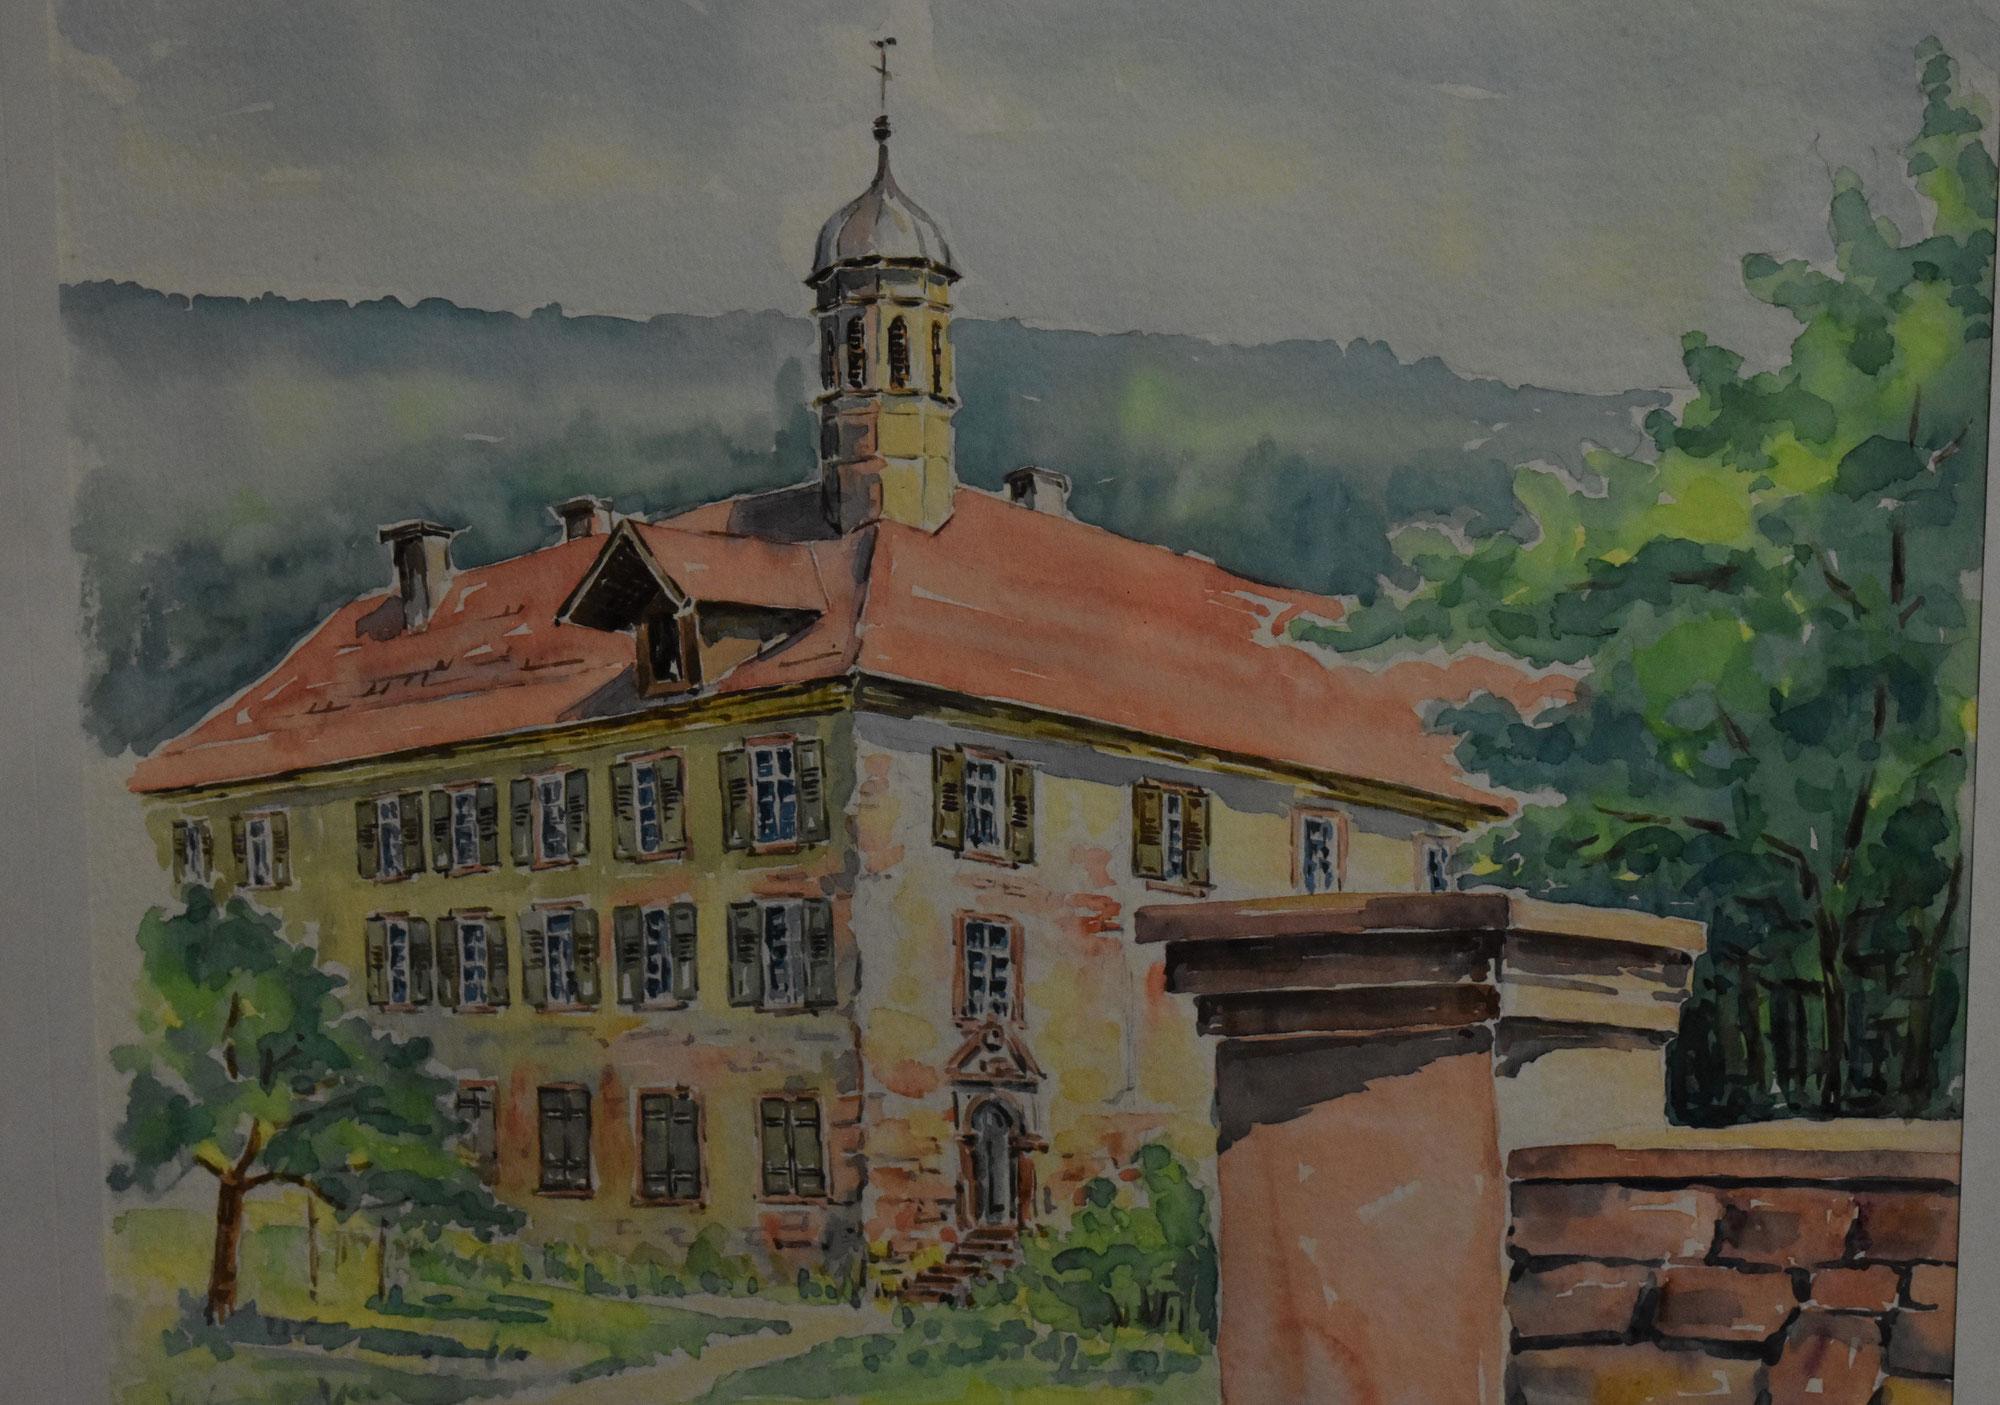 Tusche, Aquarell, ein Lebenswerk - Oswald Fahrner stellt im Kursana aus